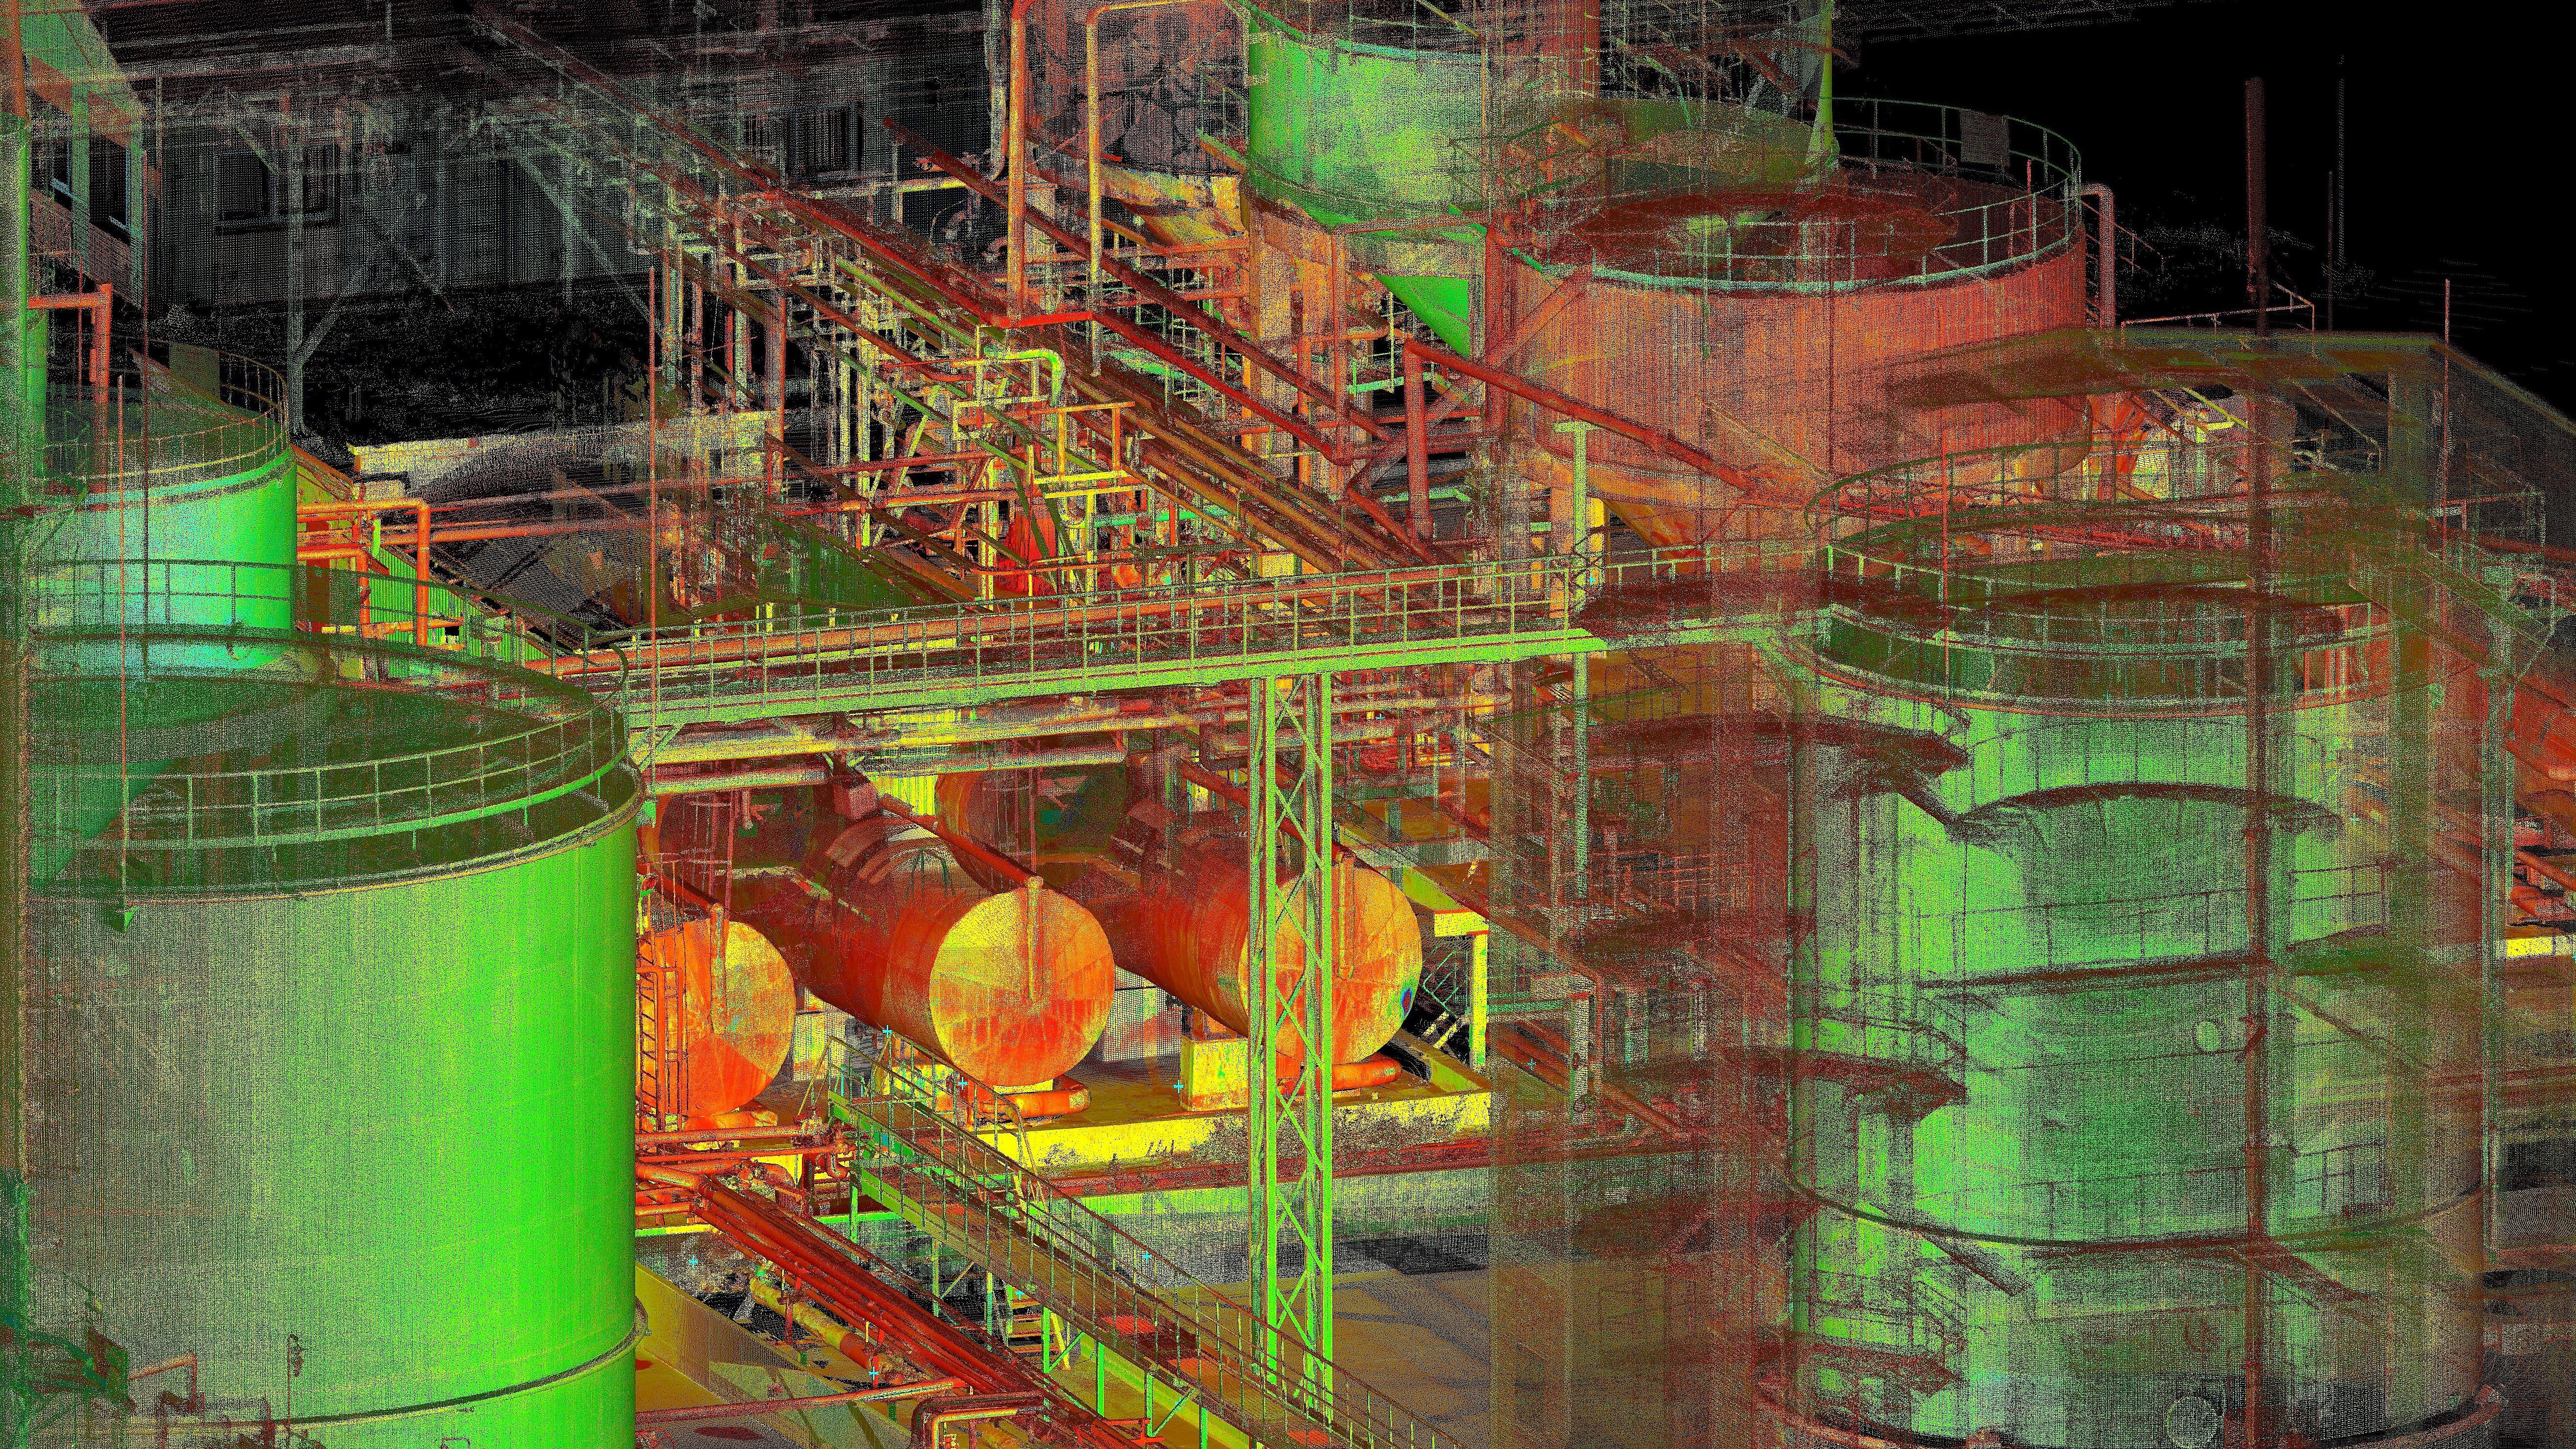 Laser scanning of the industriaal piping system in Kiviõli, Estonia